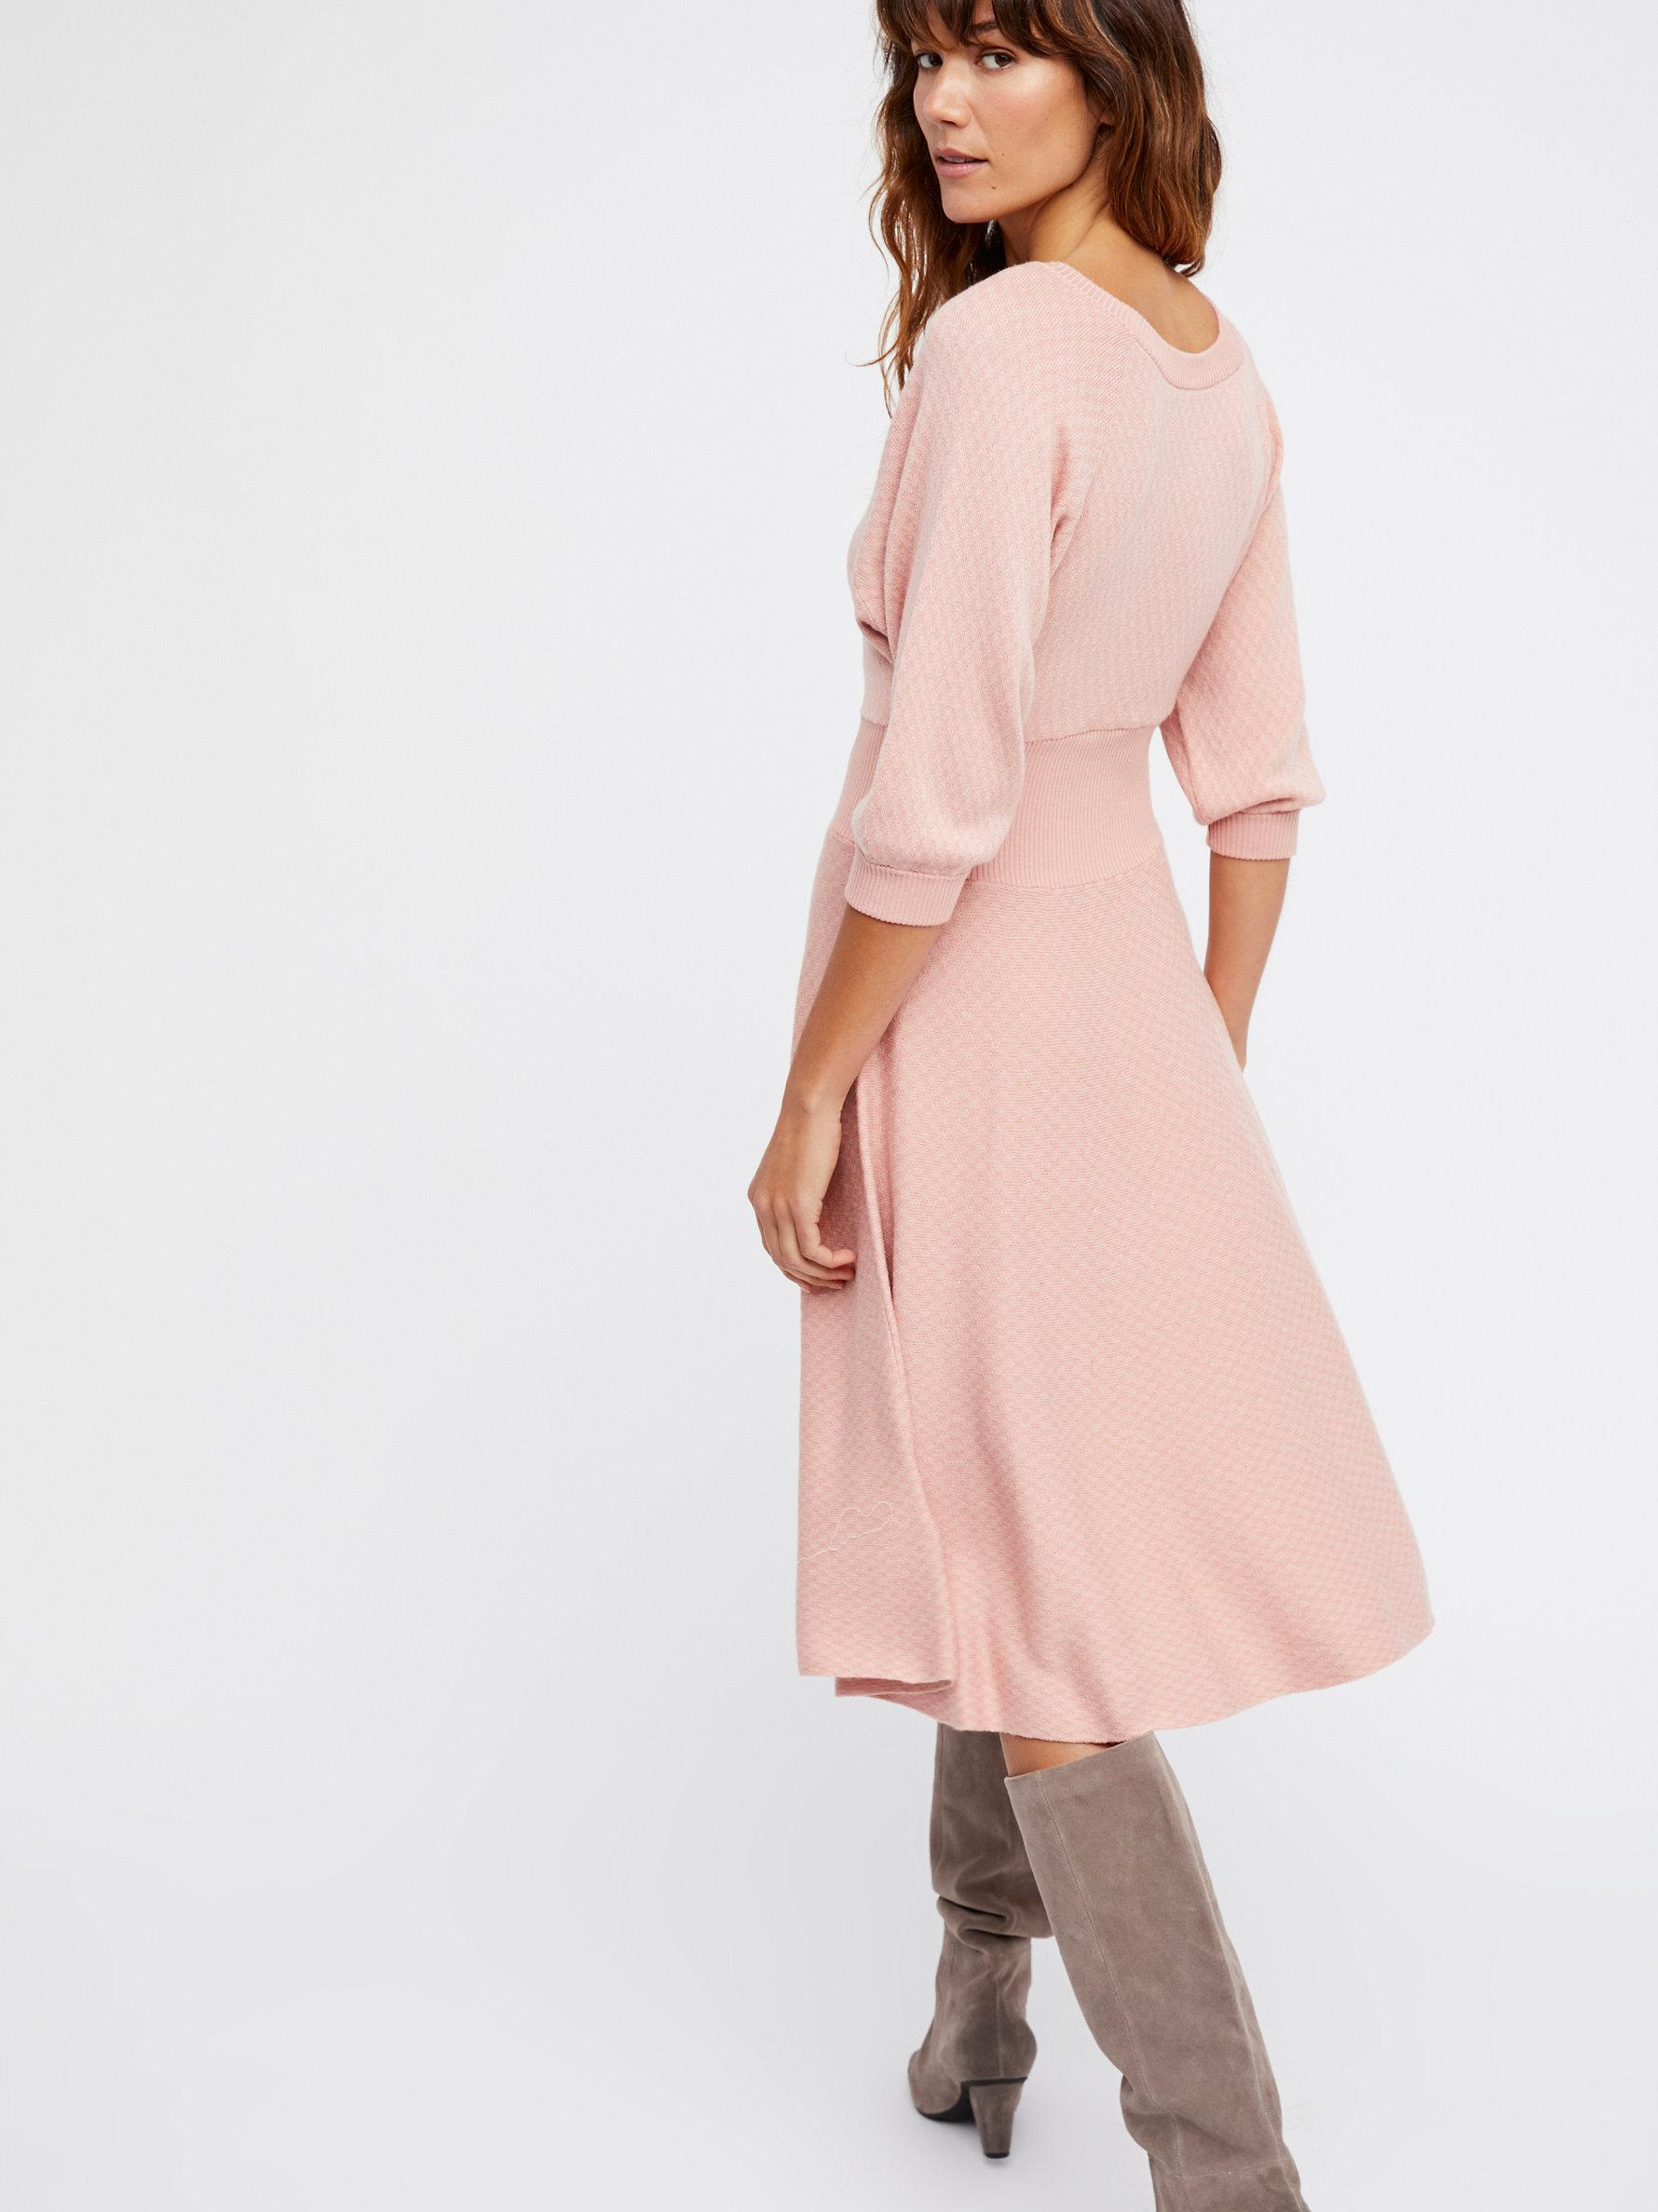 963ee32985f5c Lyst - Free People Begin Again Sweater Dress in Pink